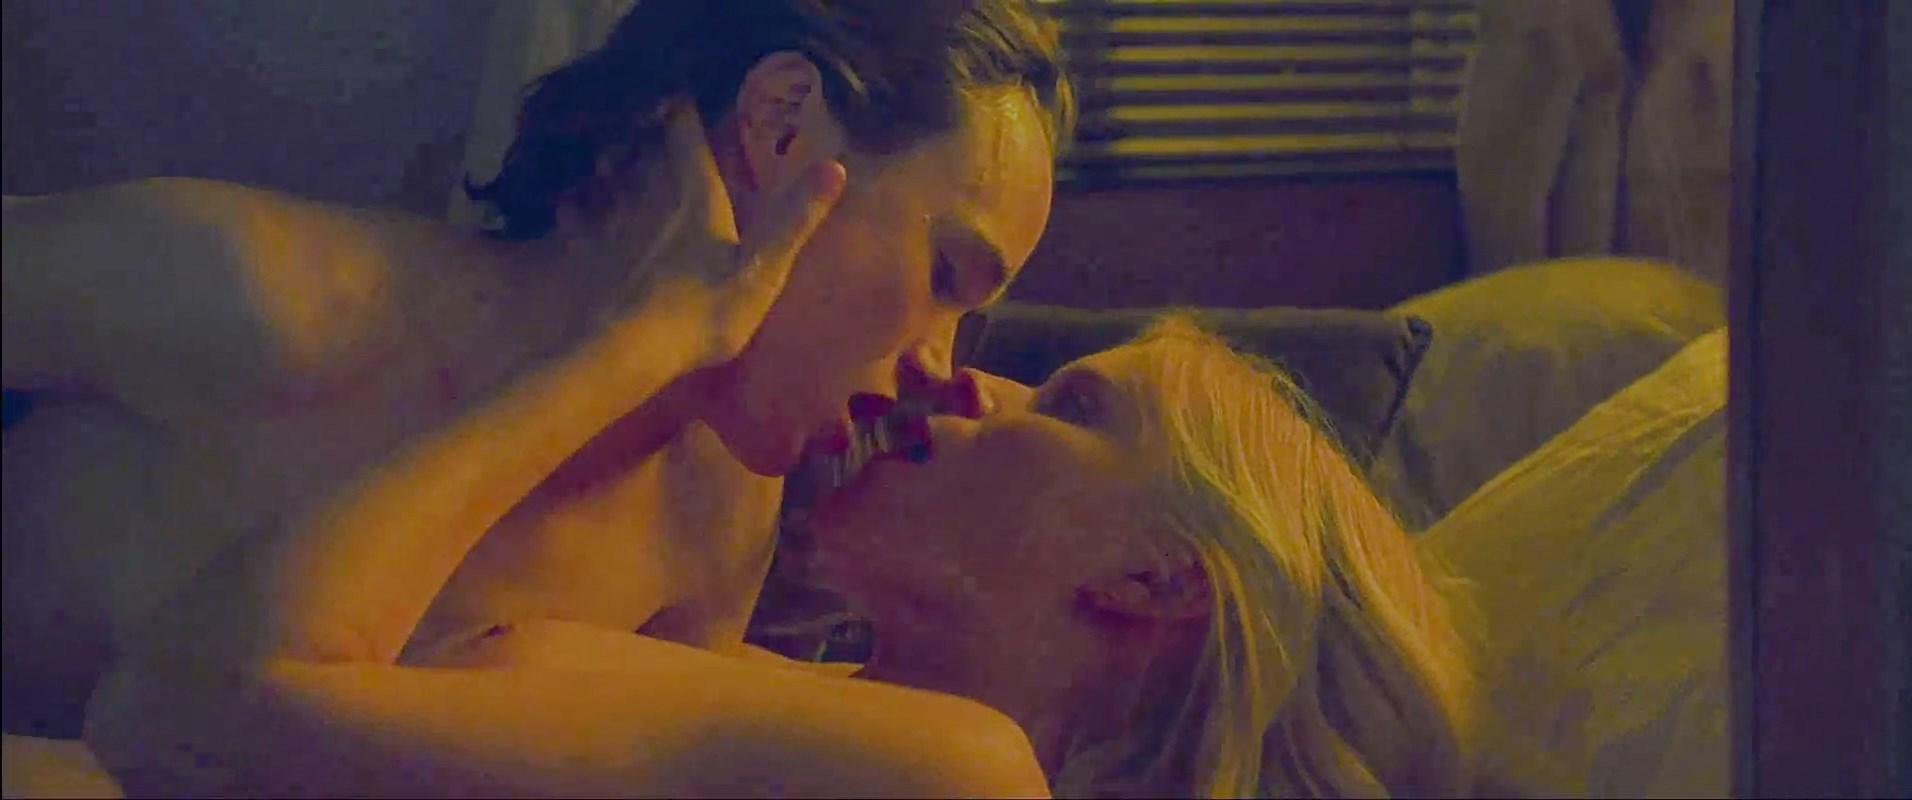 0418173952100_15_Kate-Mara-Ellen-Page-Nude-TheFappeningBlog.com-5.jpg